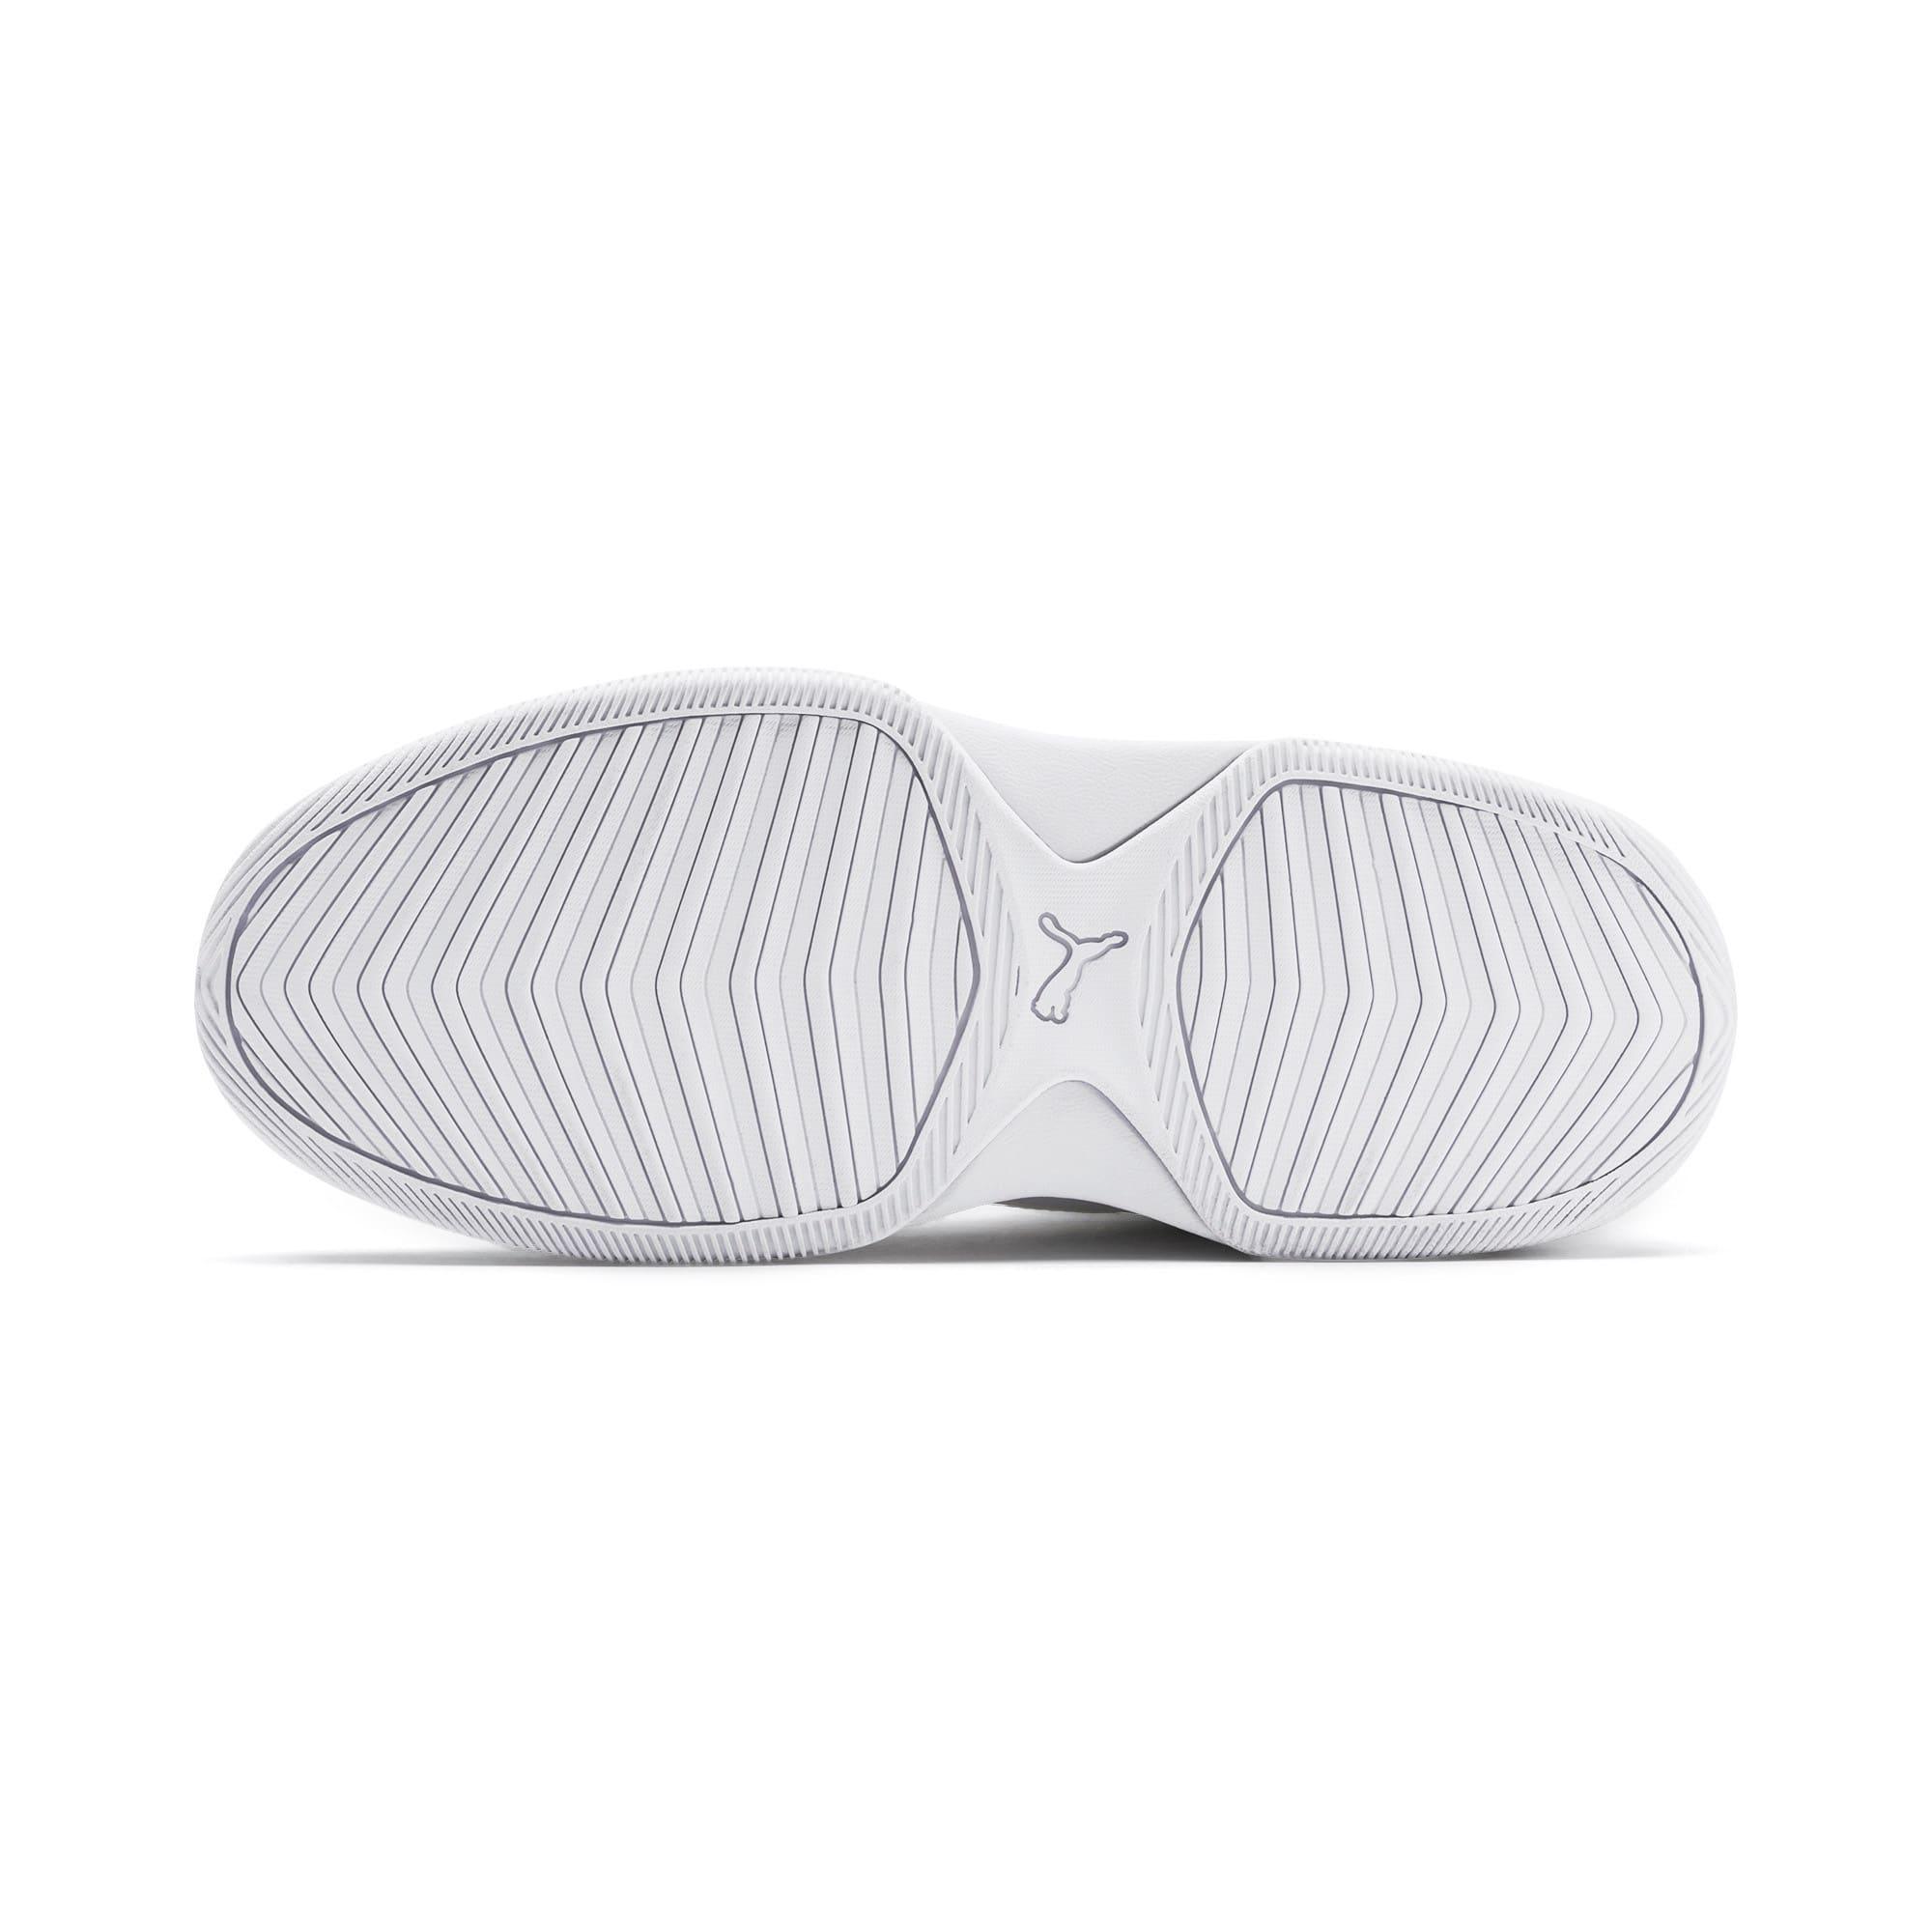 Thumbnail 4 of PUMA Rebound Playoff SL Sneakers JR, Puma White-Puma Silver, medium